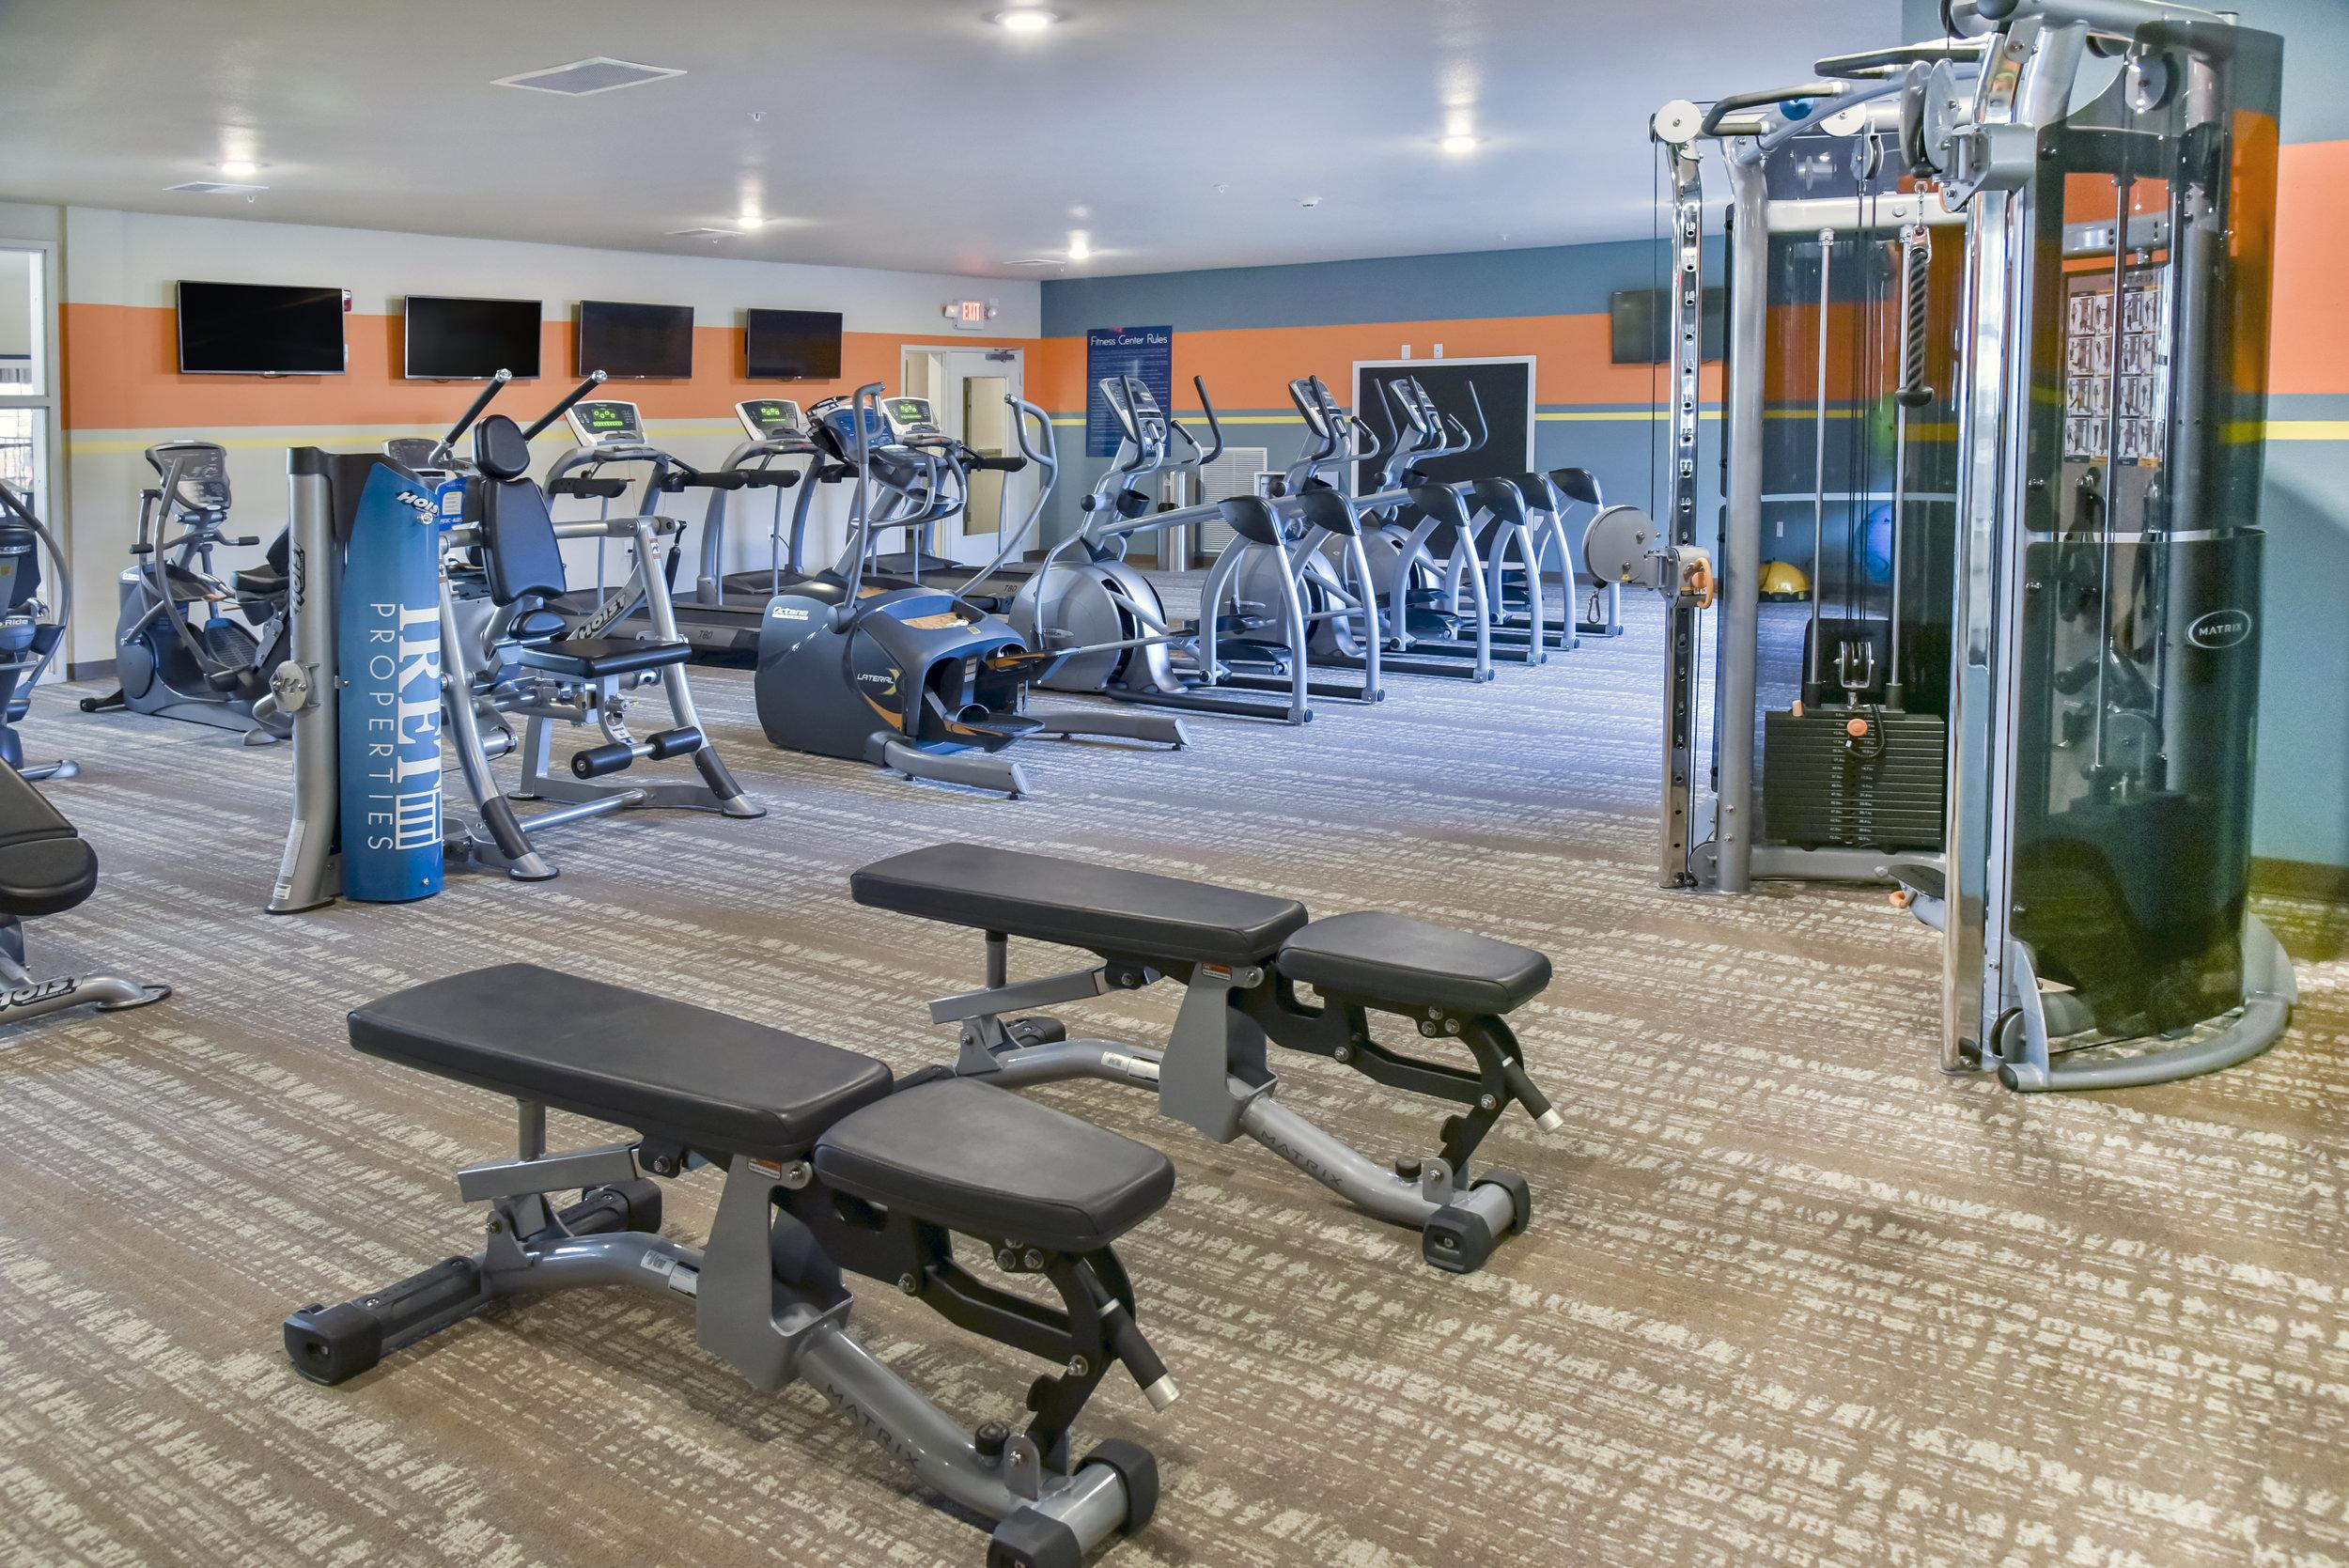 13 Fitness Center with Cardio _ Strength Equipment.jpg